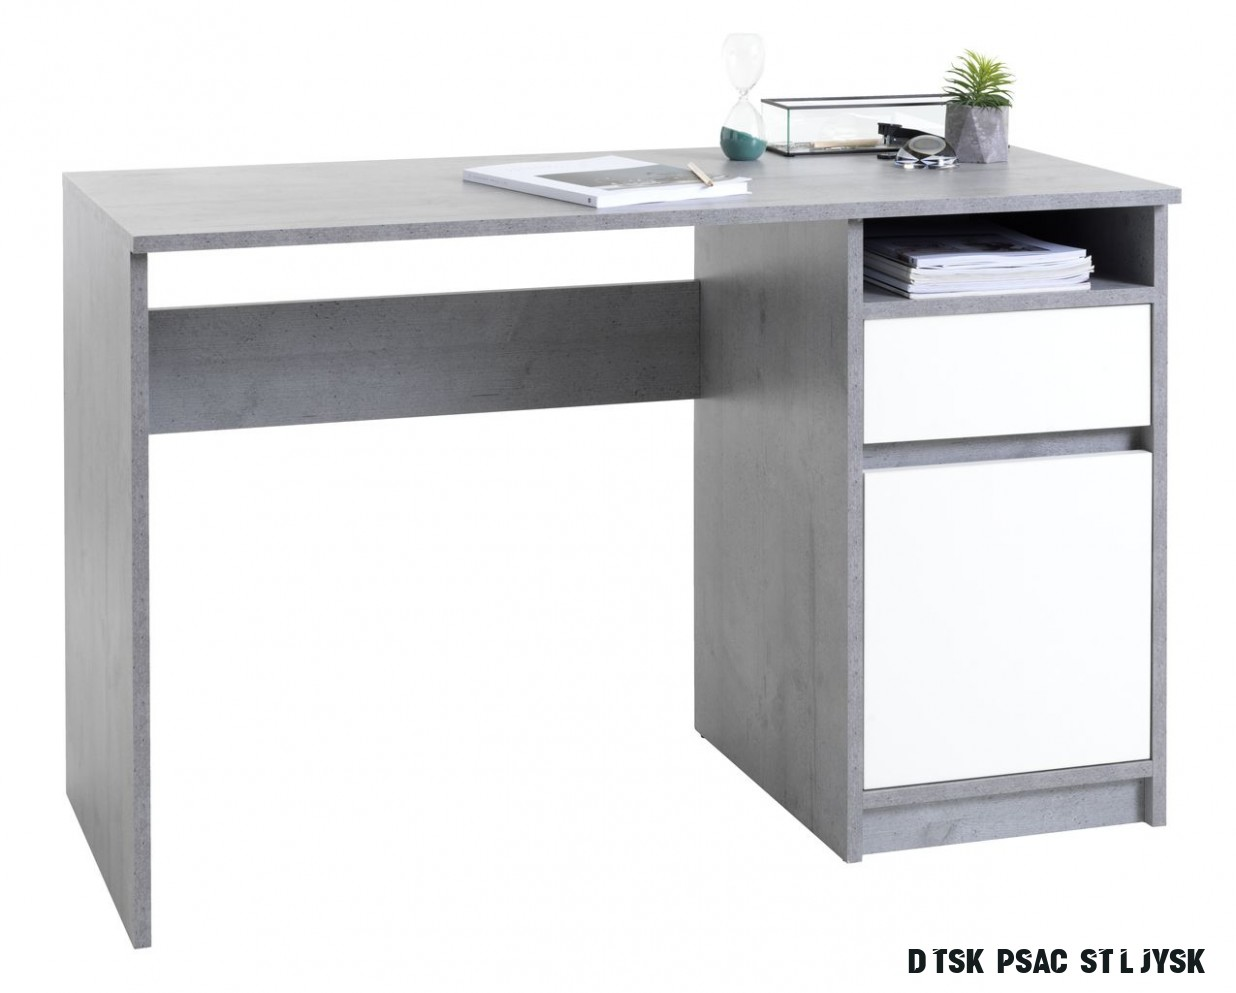 Psací stůl BILLUND 17x17 beton/bílá